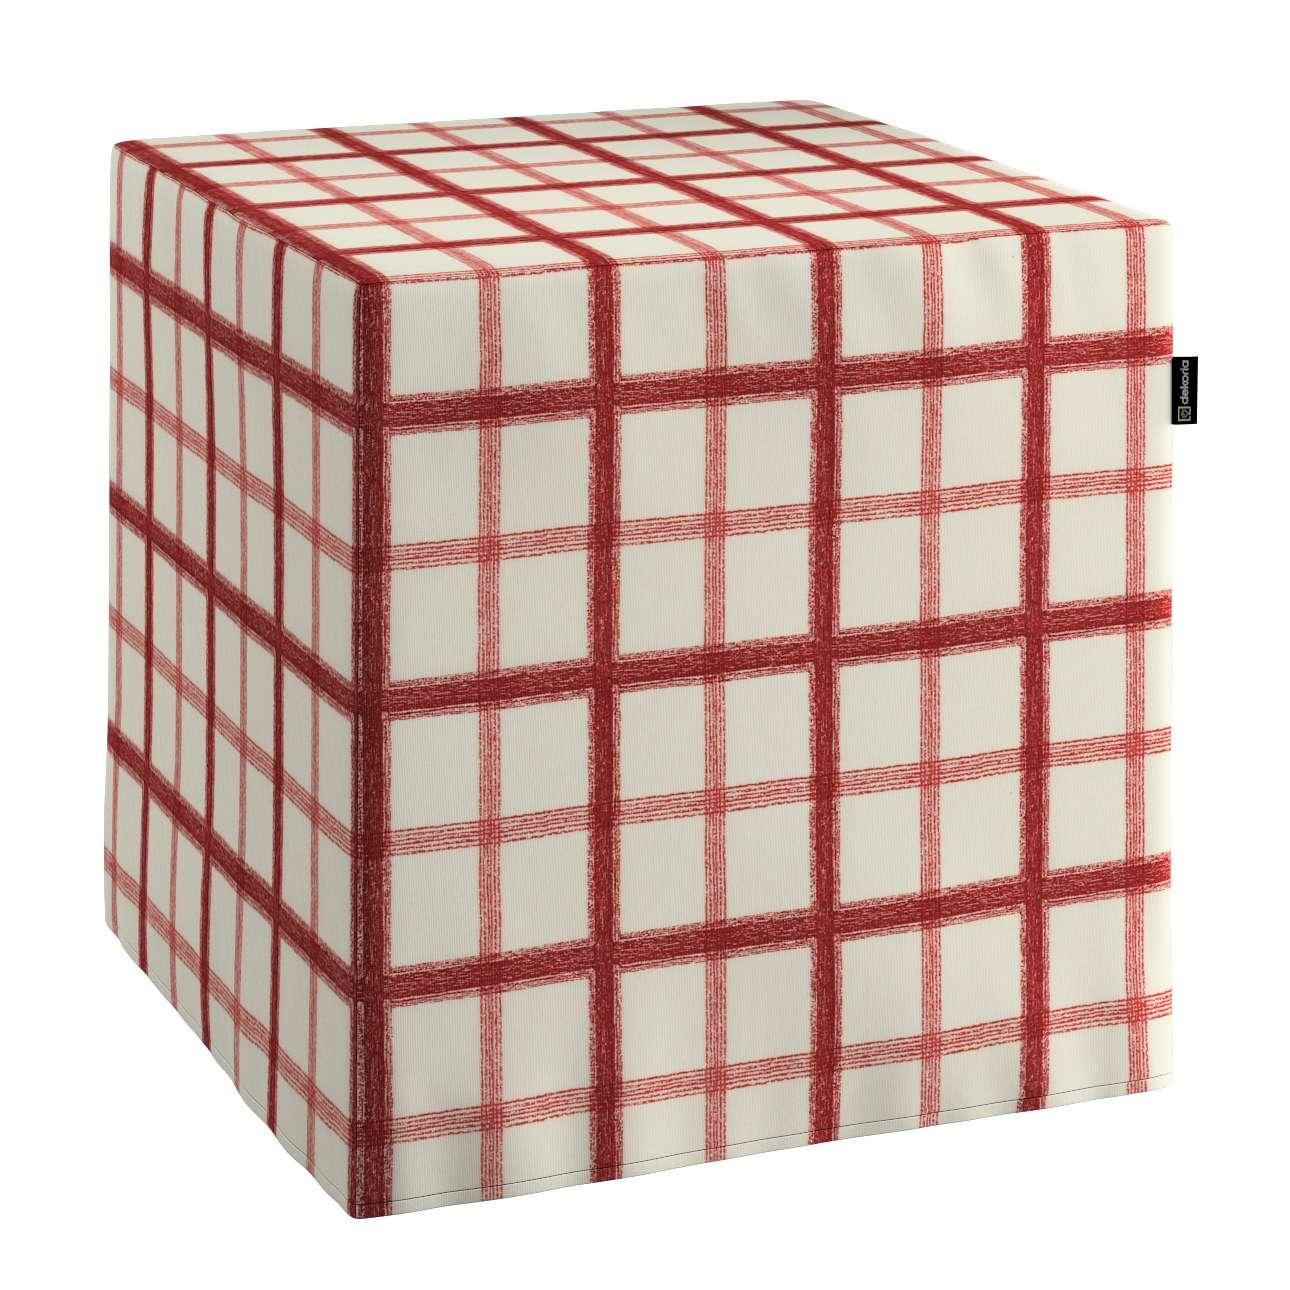 Sedák Cube - kostka pevná 40x40x40 v kolekci Avignon, látka: 131-15